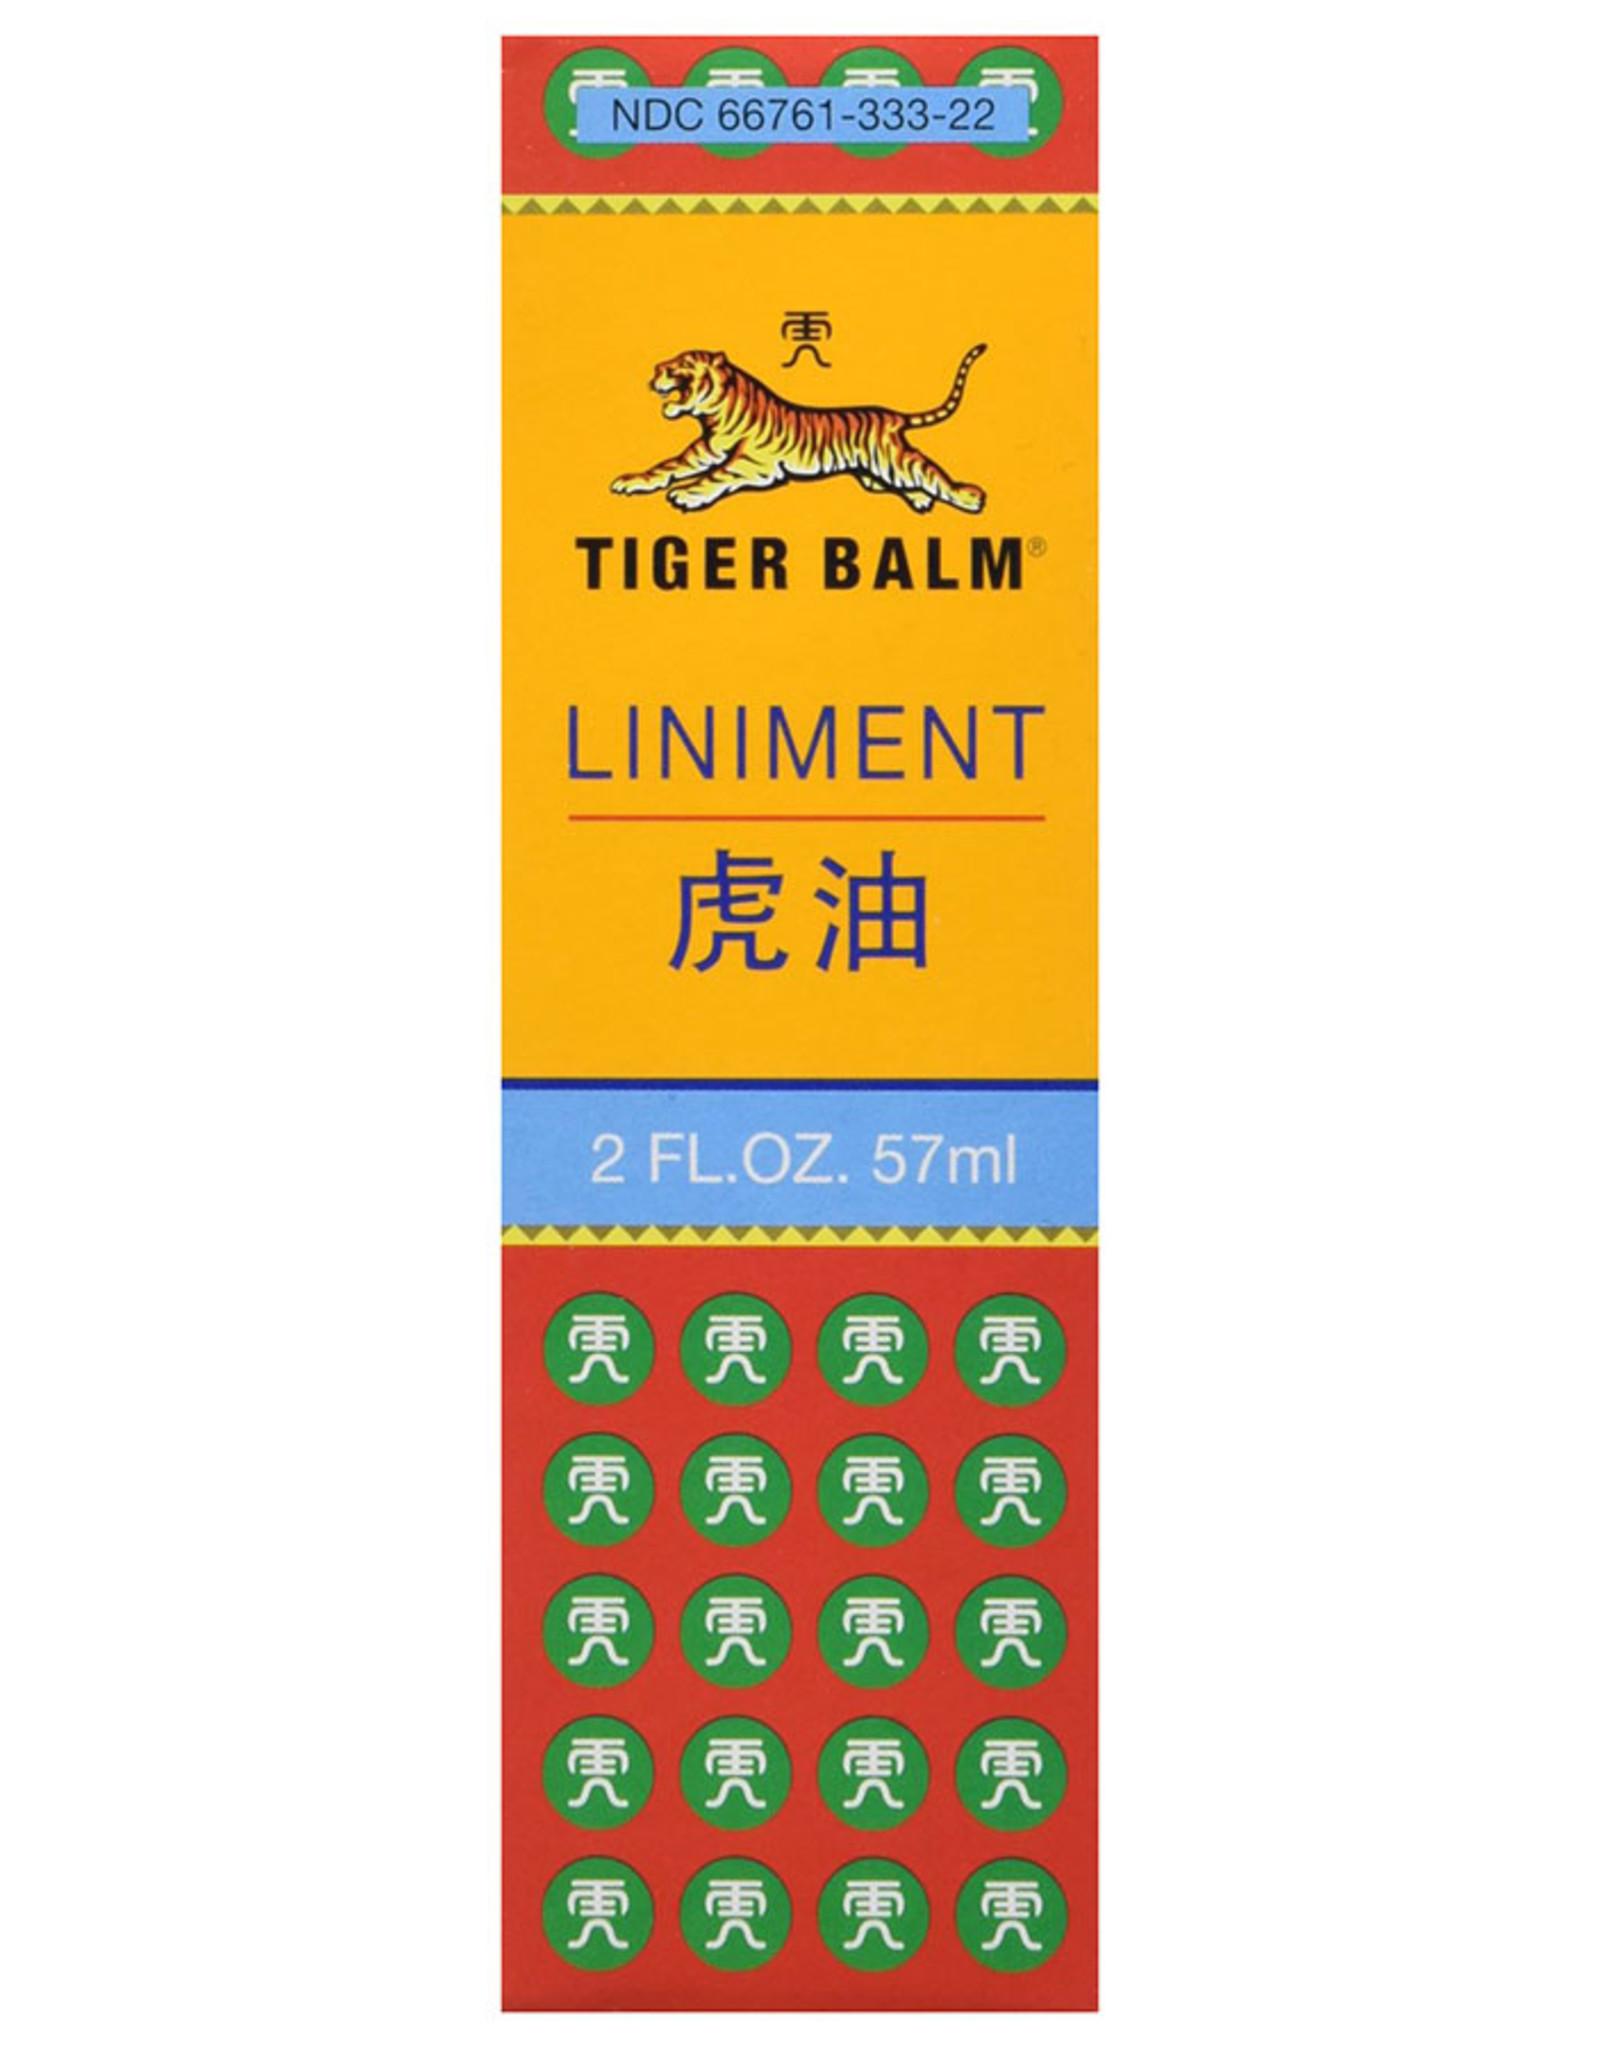 Tiger Balm Tiger Balm Liniment